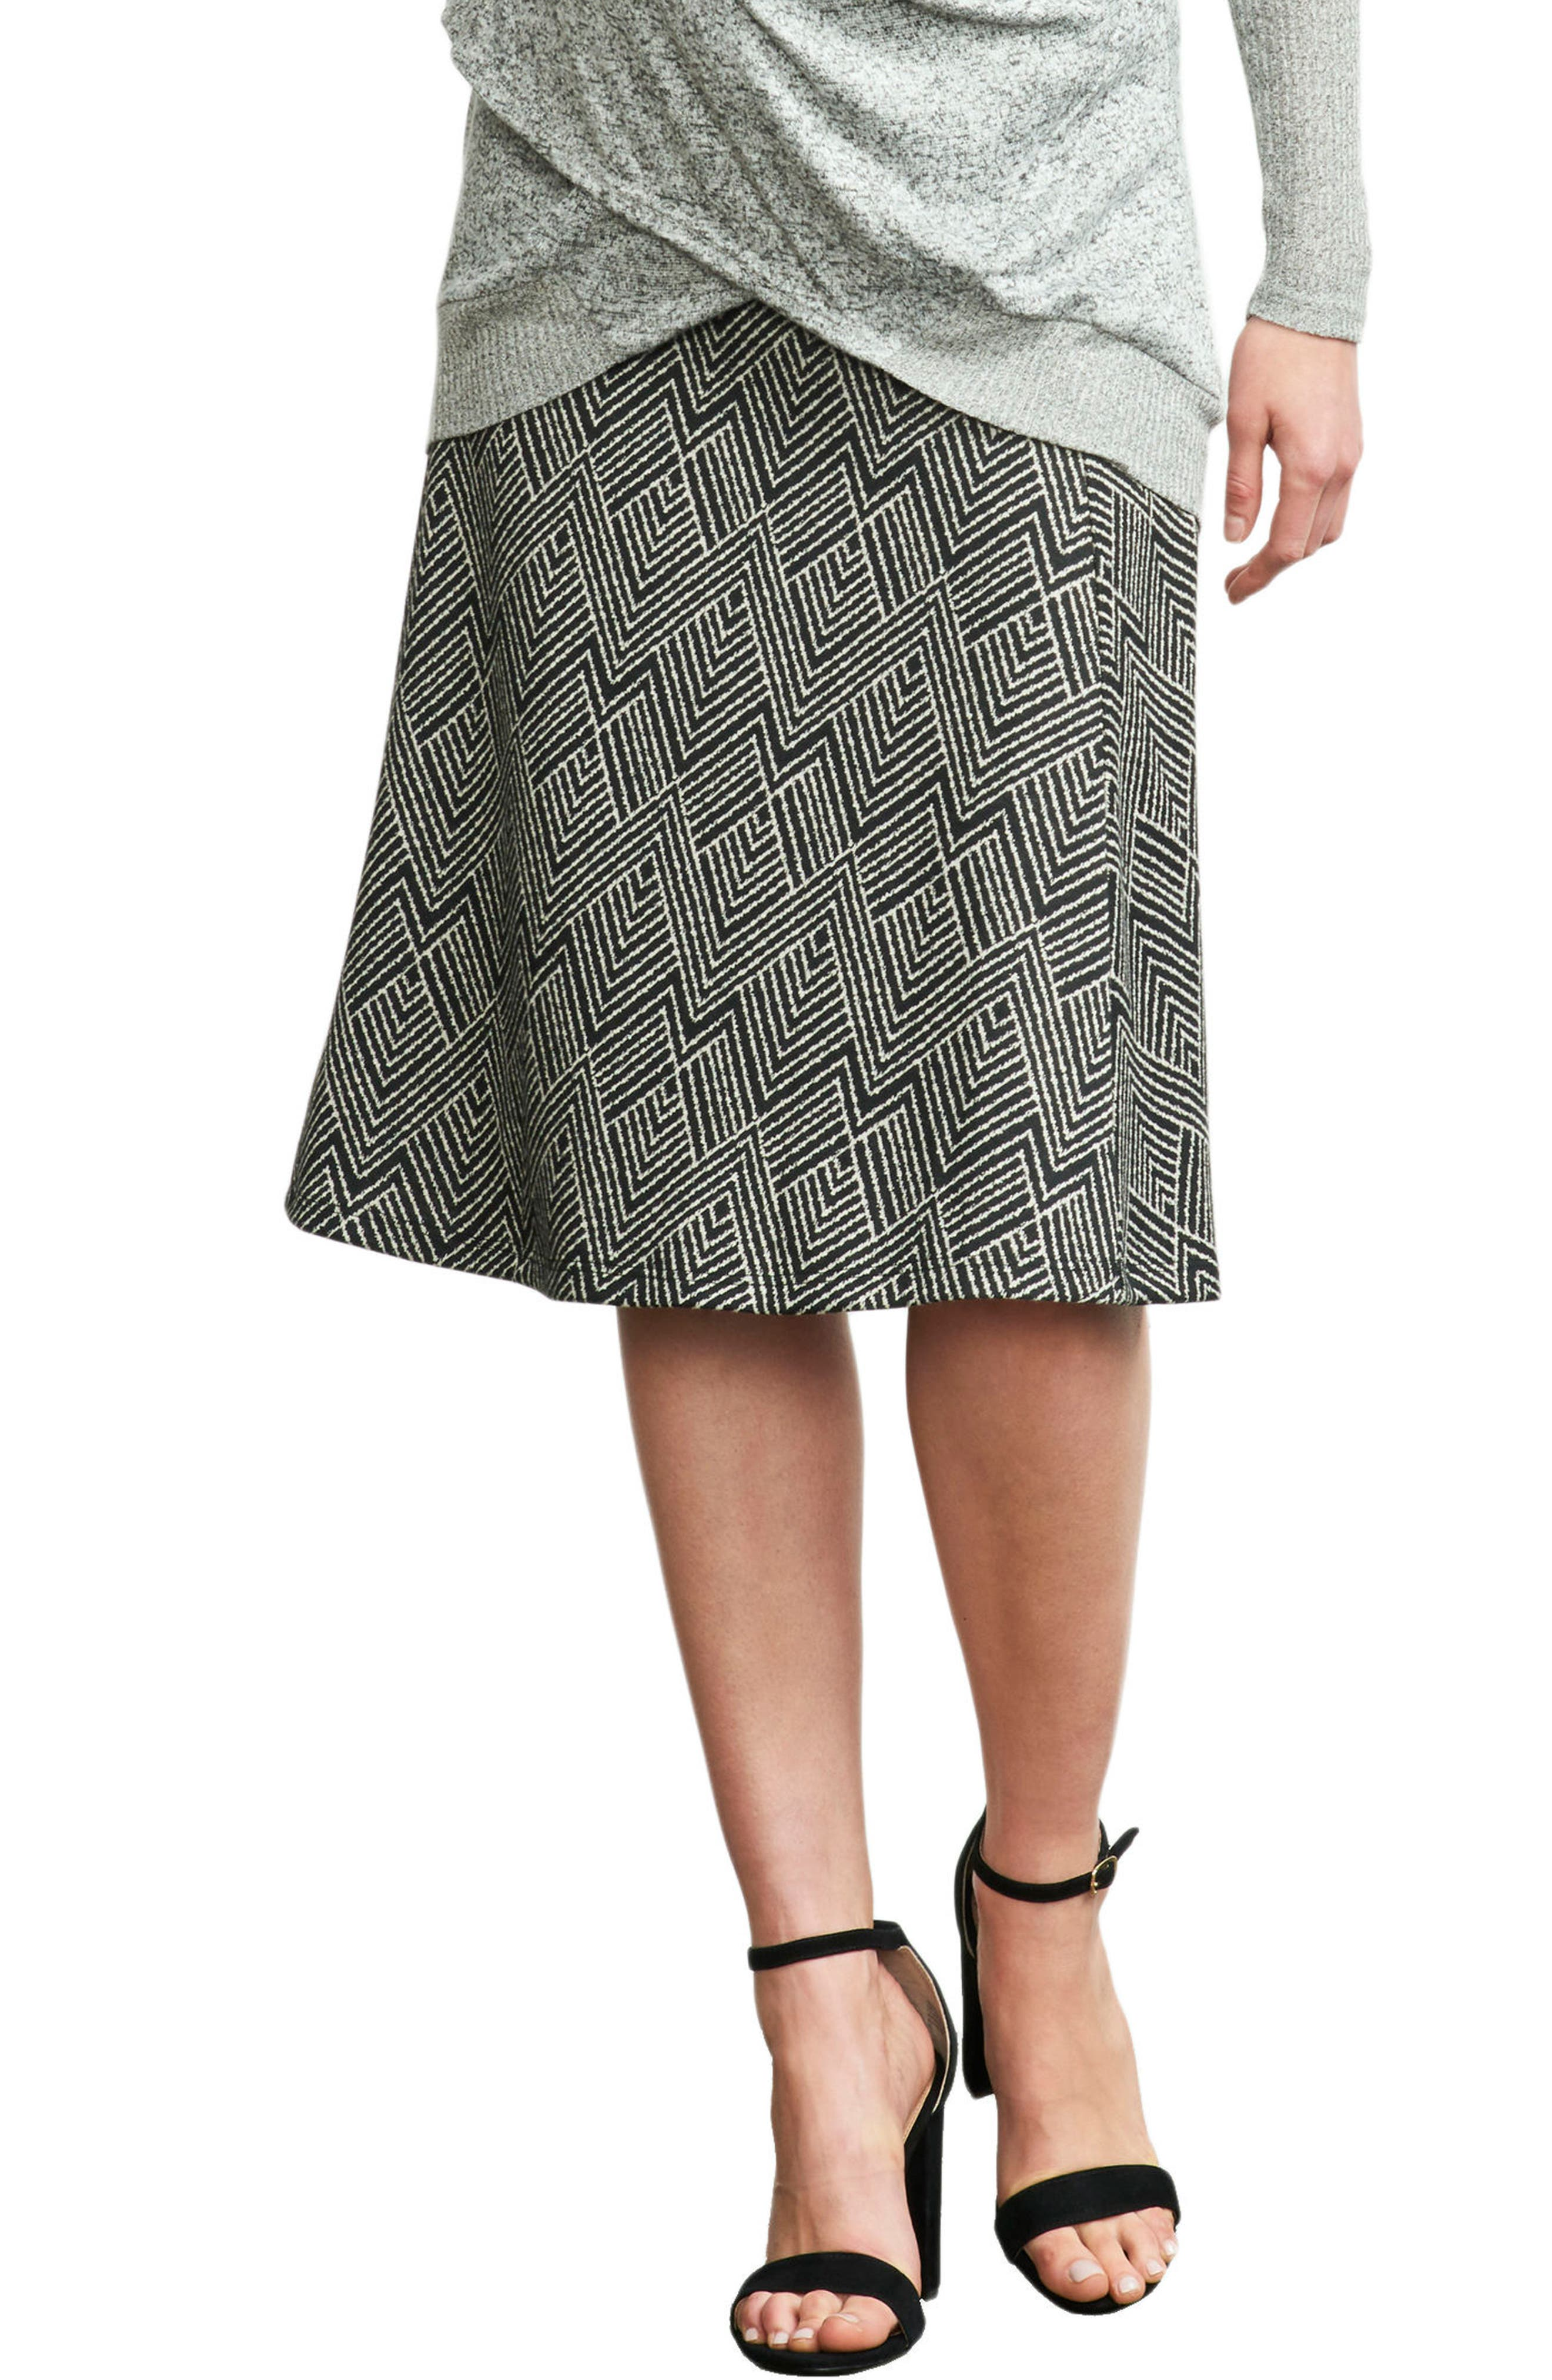 Maternal America Print A-Line Maternity Skirt